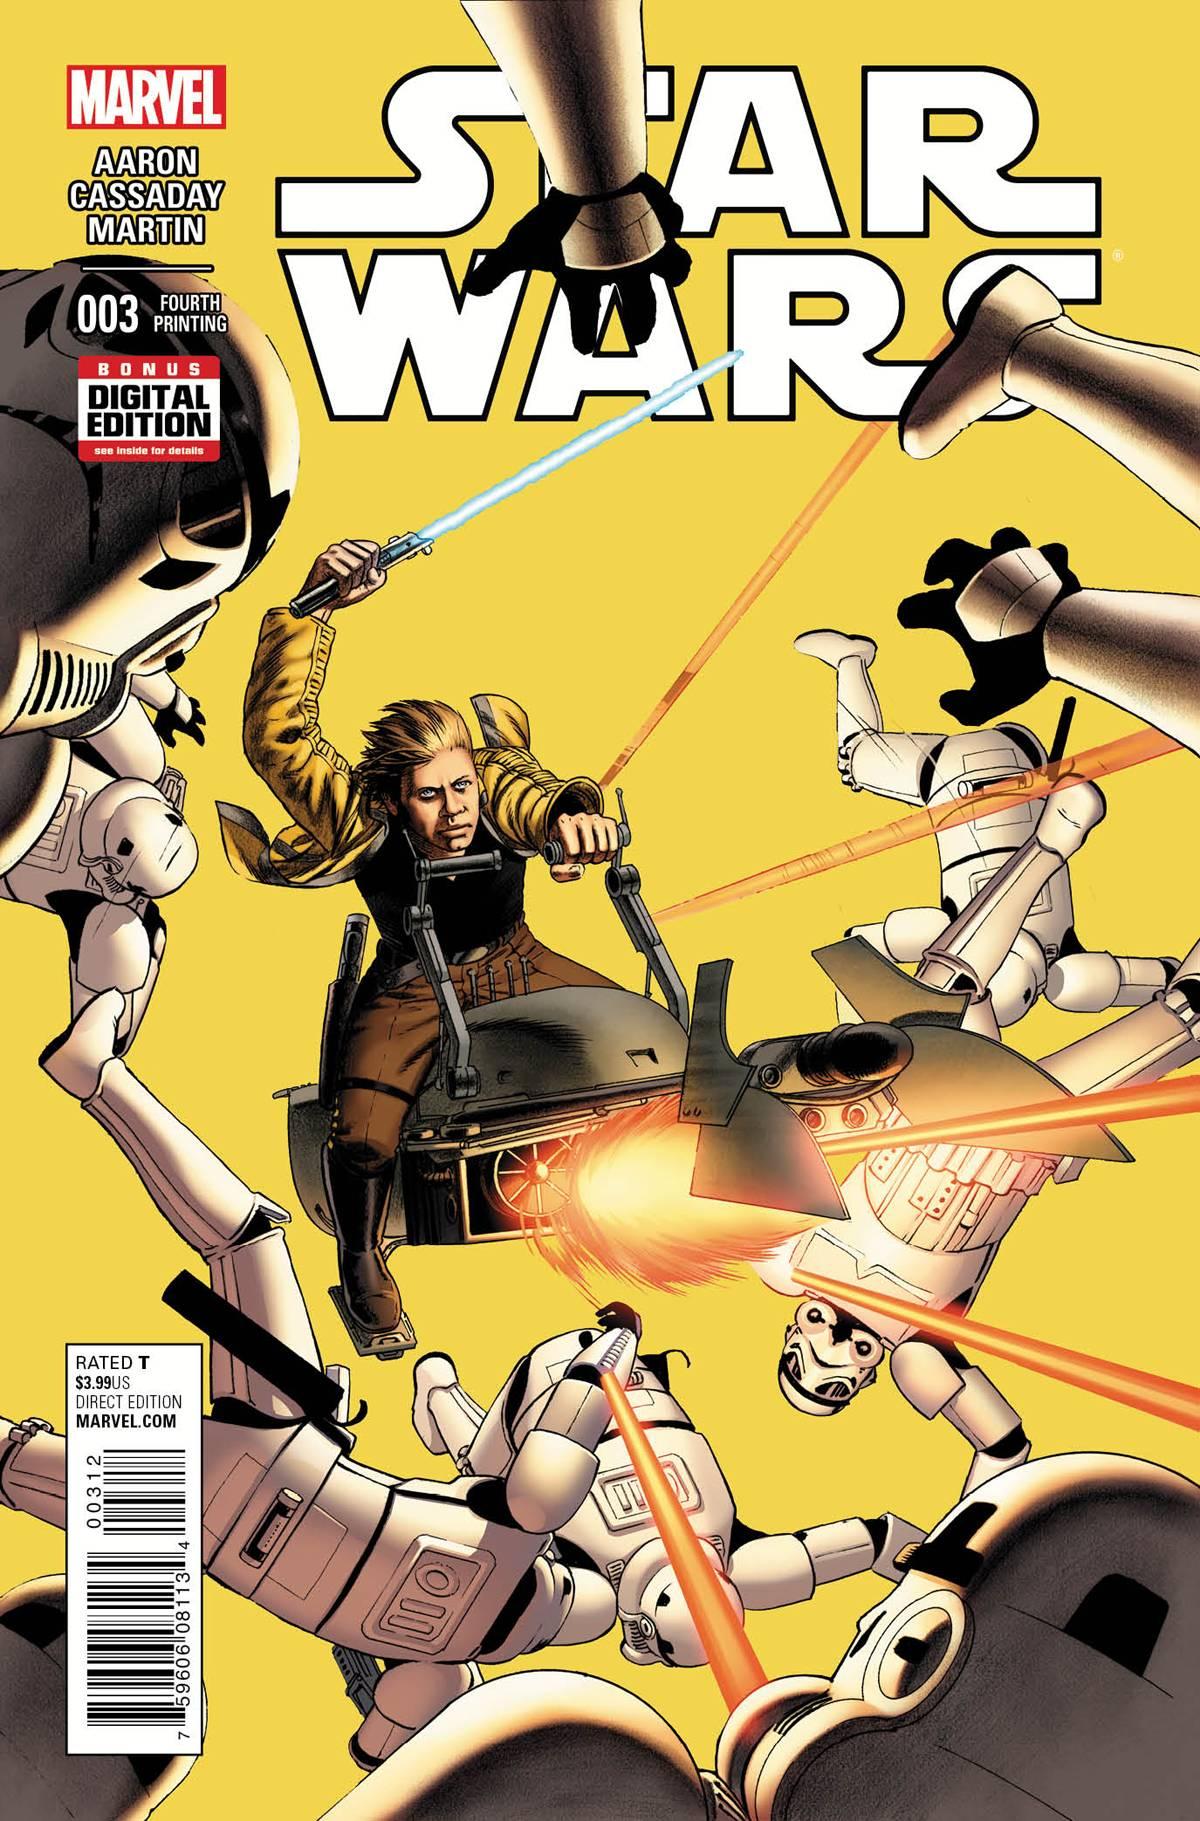 Star Wars #3 (4th Printing) (04.11.2015)